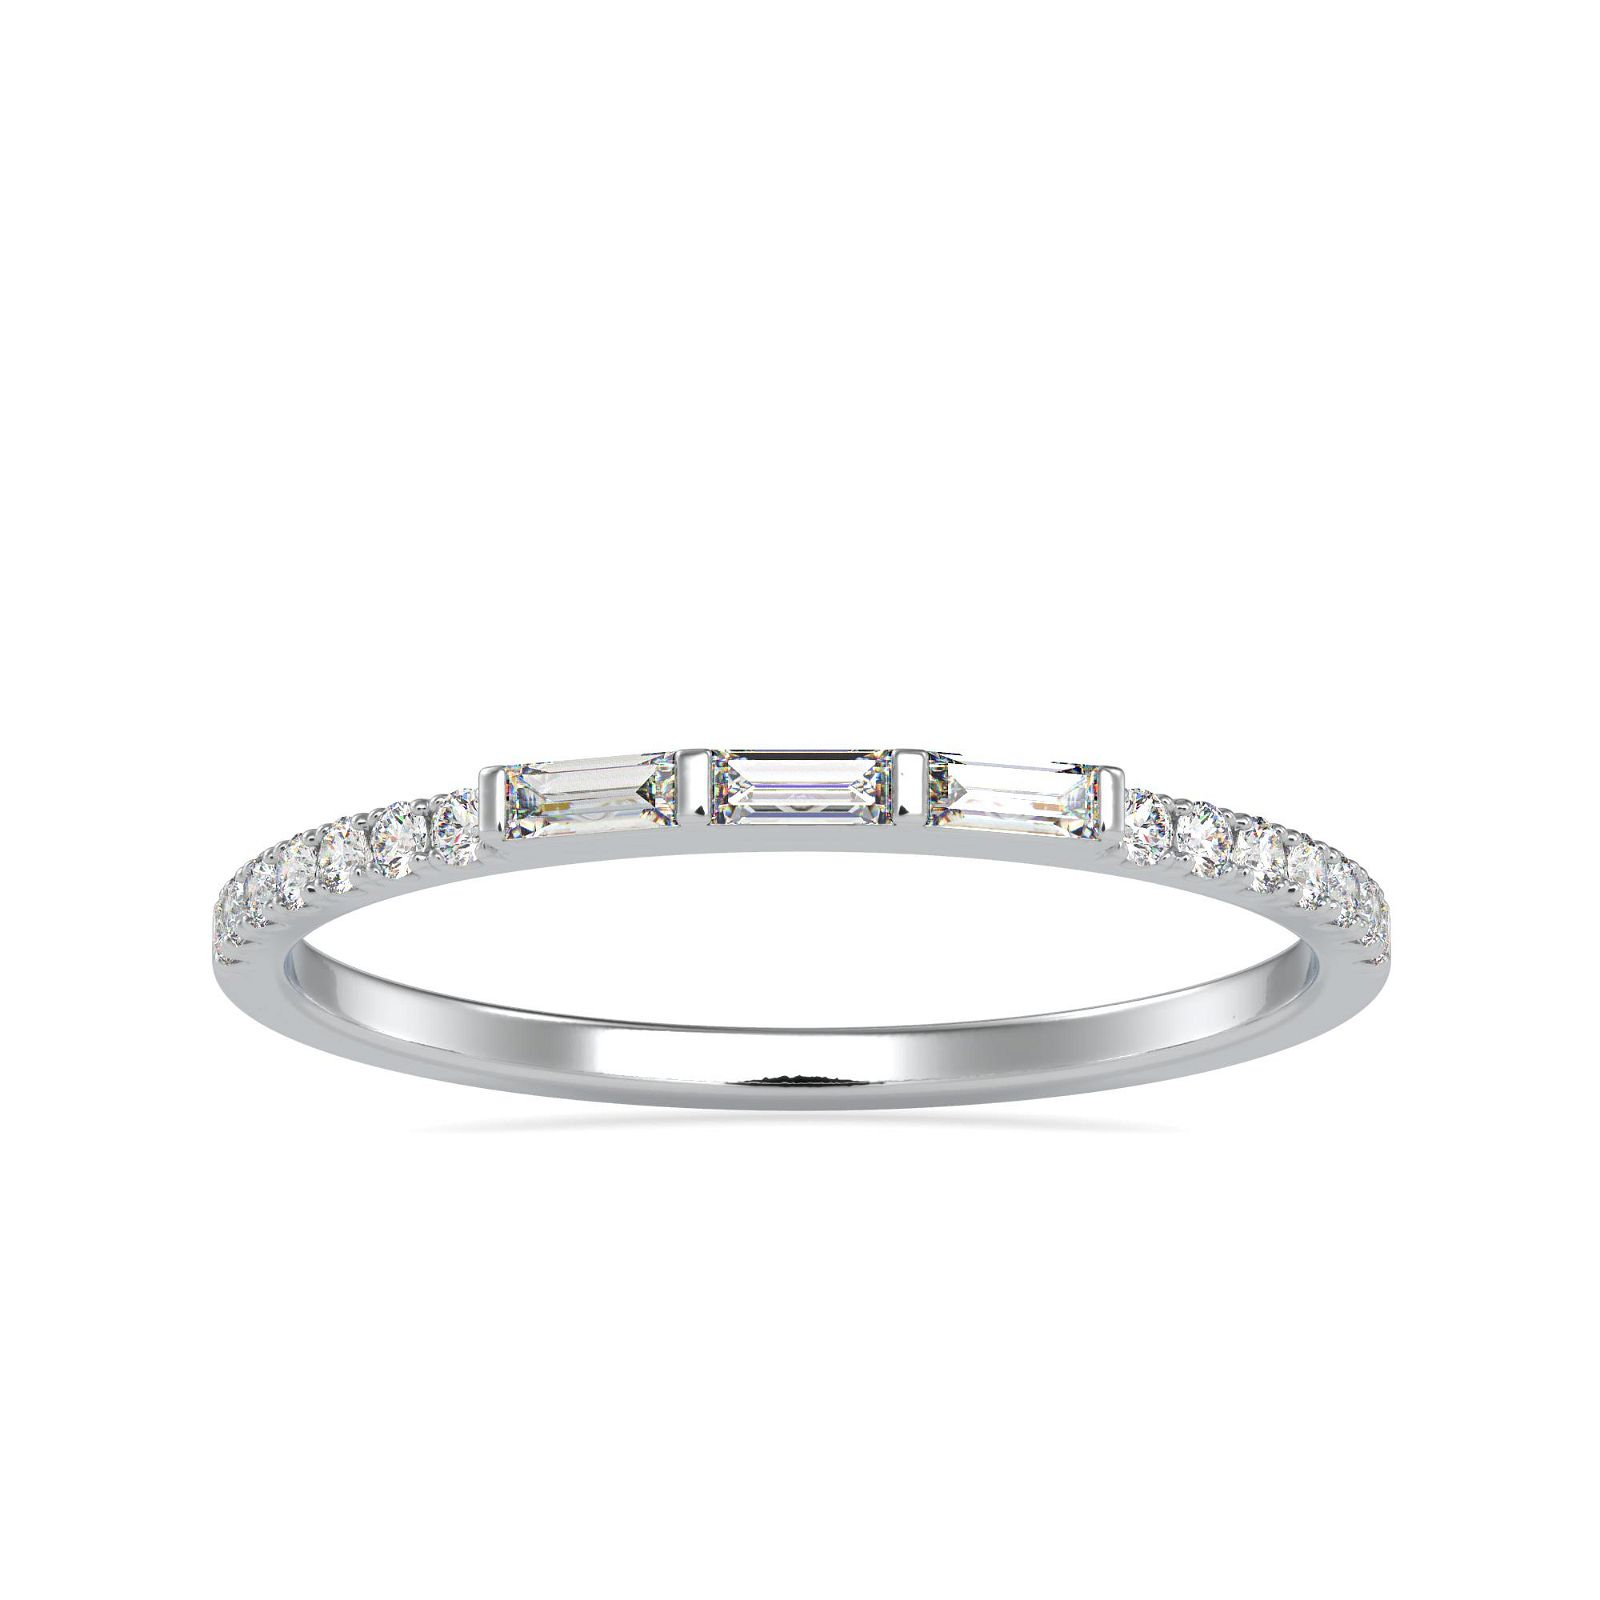 0.19CT Natural Diamond 14K White Gold Ring